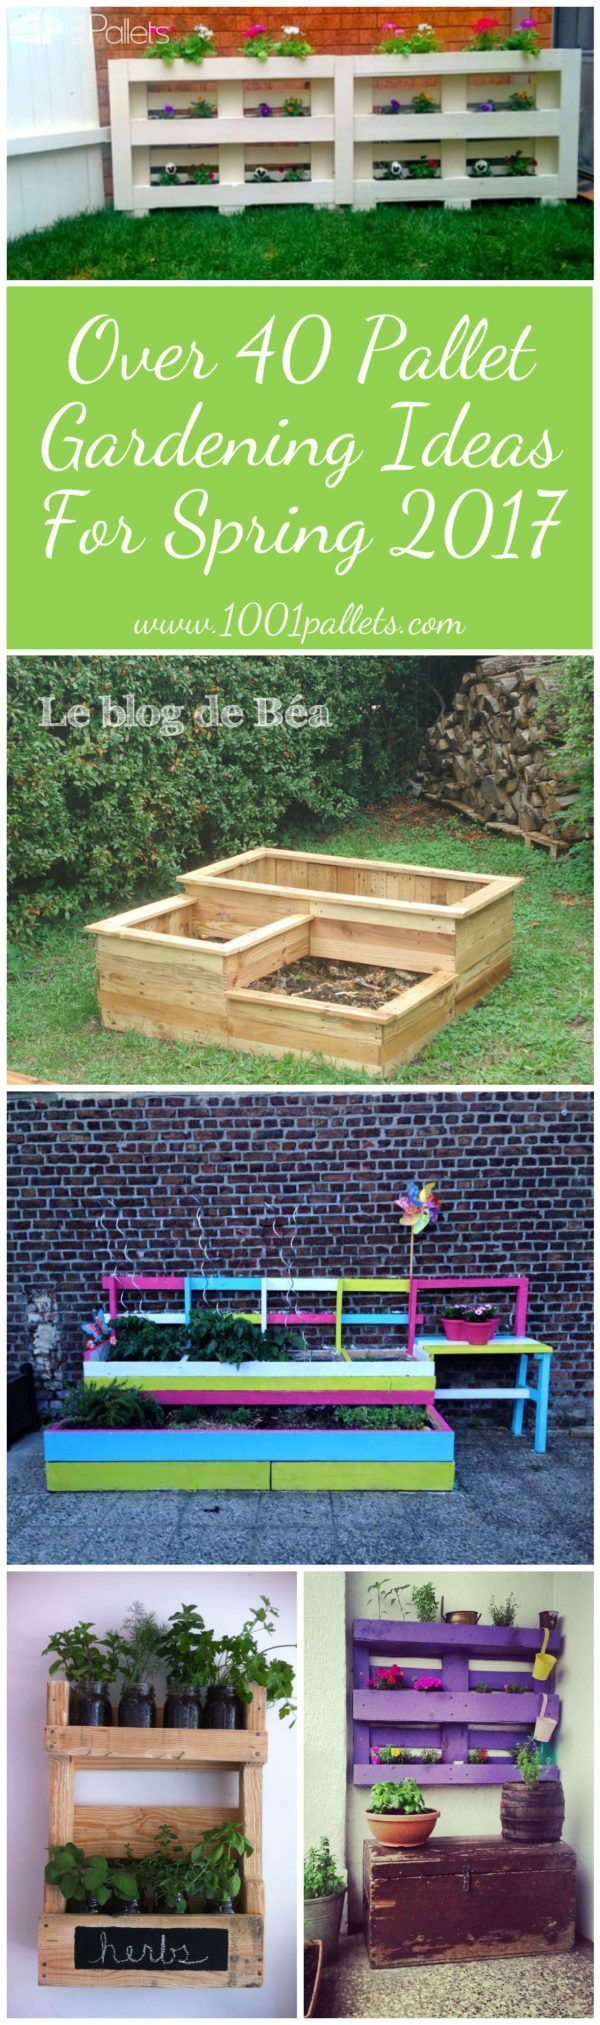 Over 40 Pallet Gardening Ideas for Spring 2017